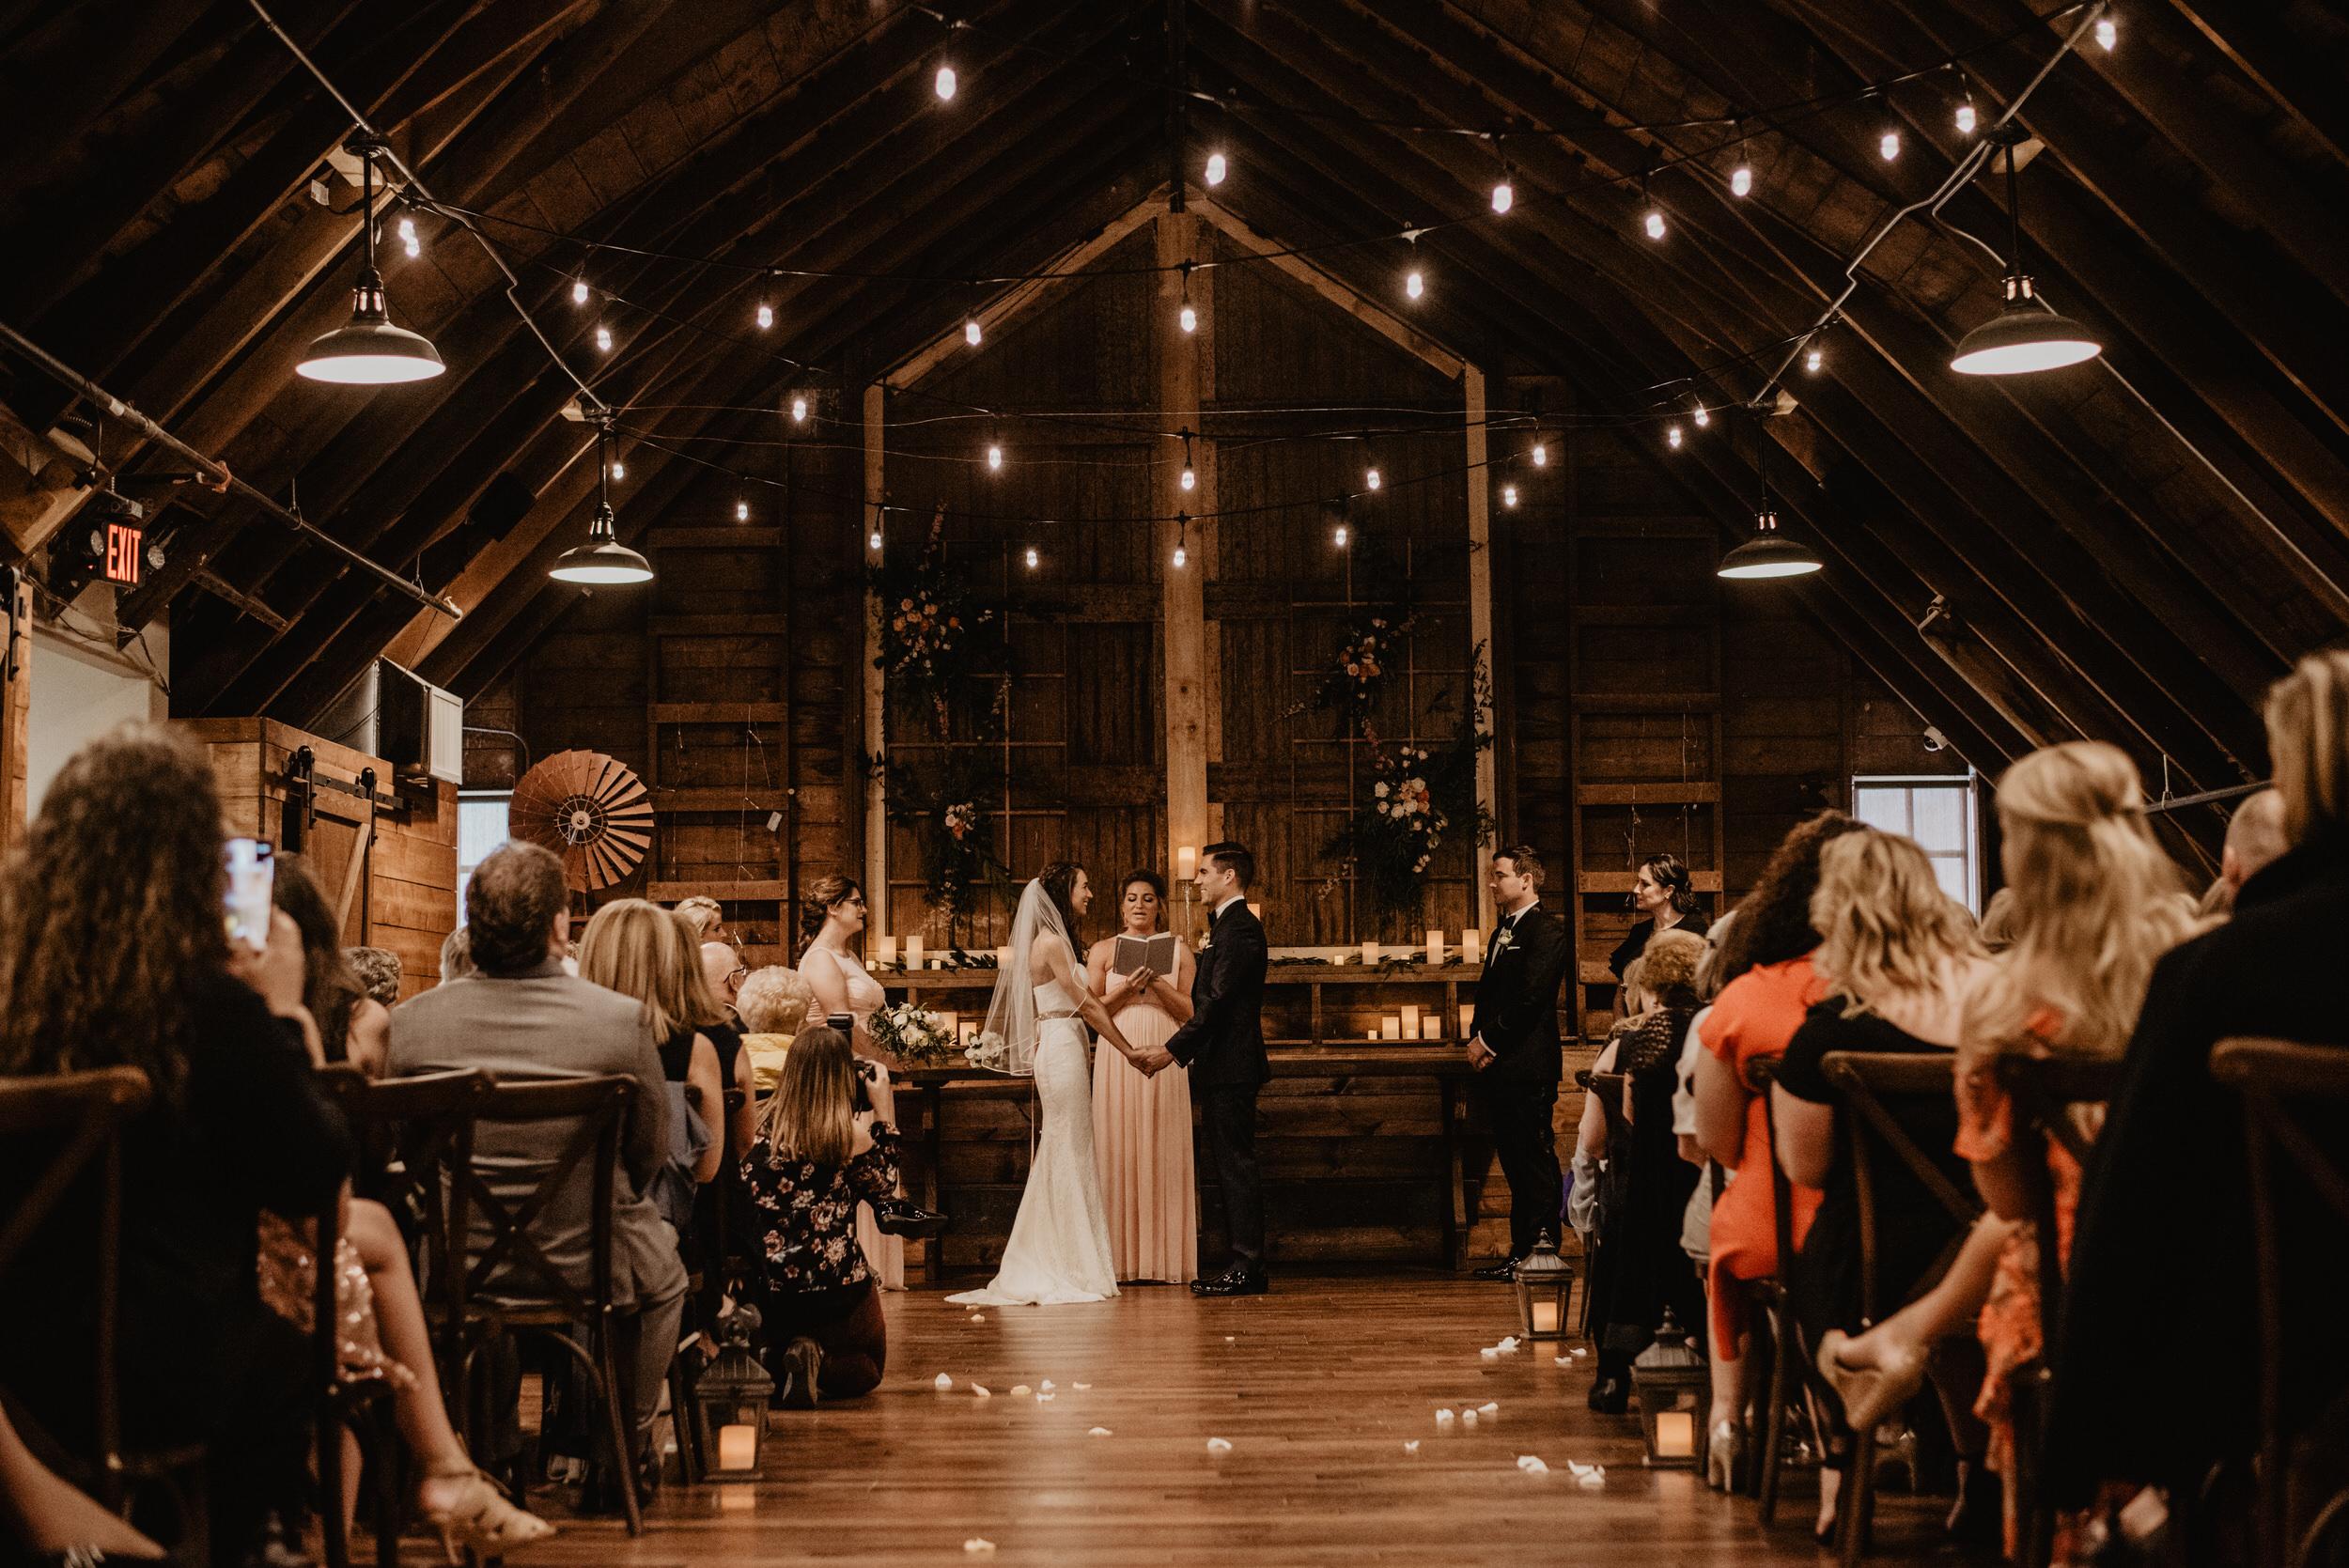 The+Barn+at+the+Ackerhurst+Dairy+Farm+Omaha+Nebraska+Wedding+Kaylie+Sirek+Photography075.jpg